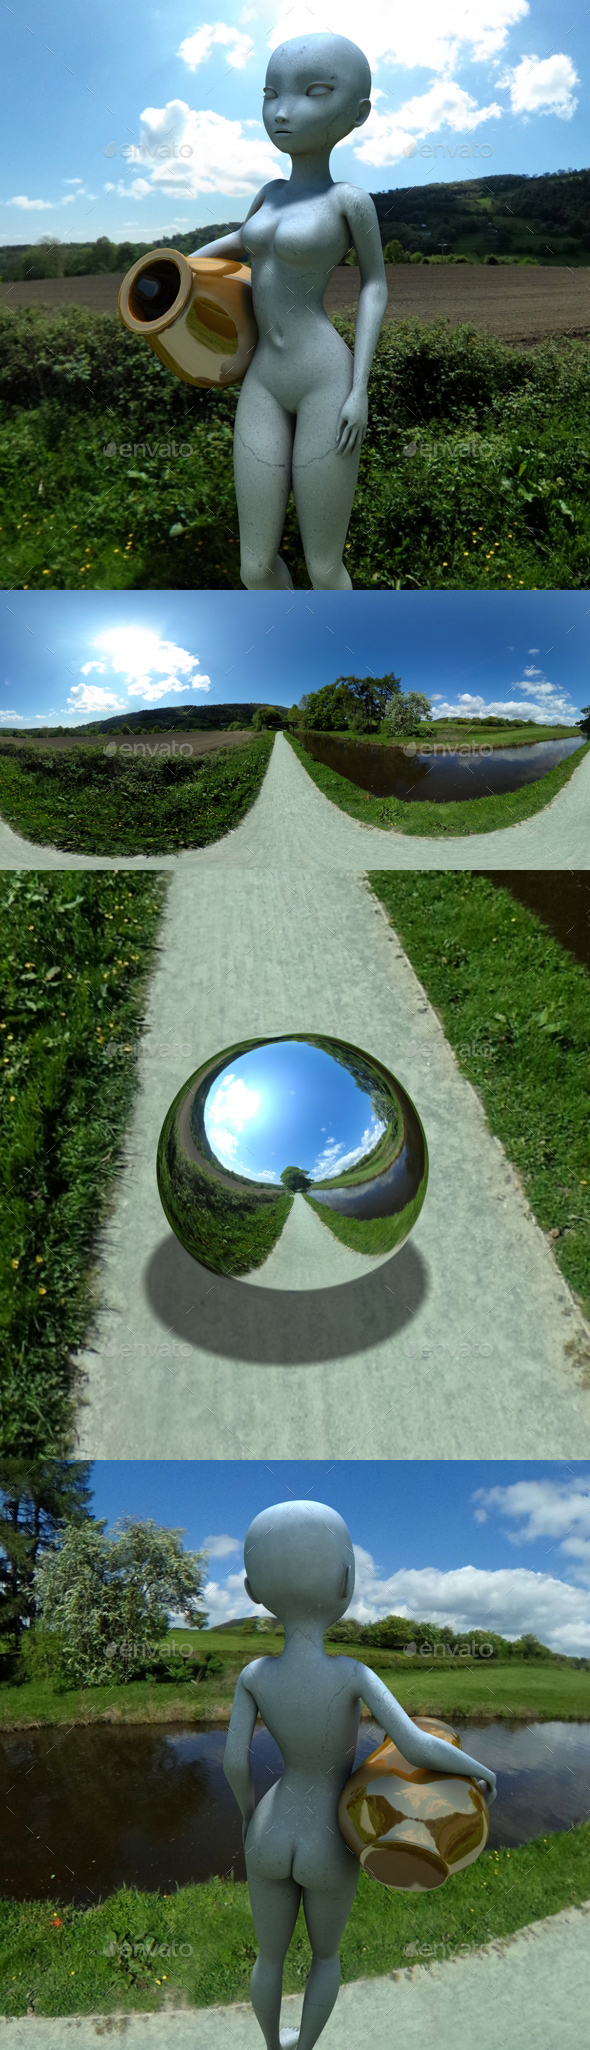 Canal Riverside HDRI - 3DOcean Item for Sale